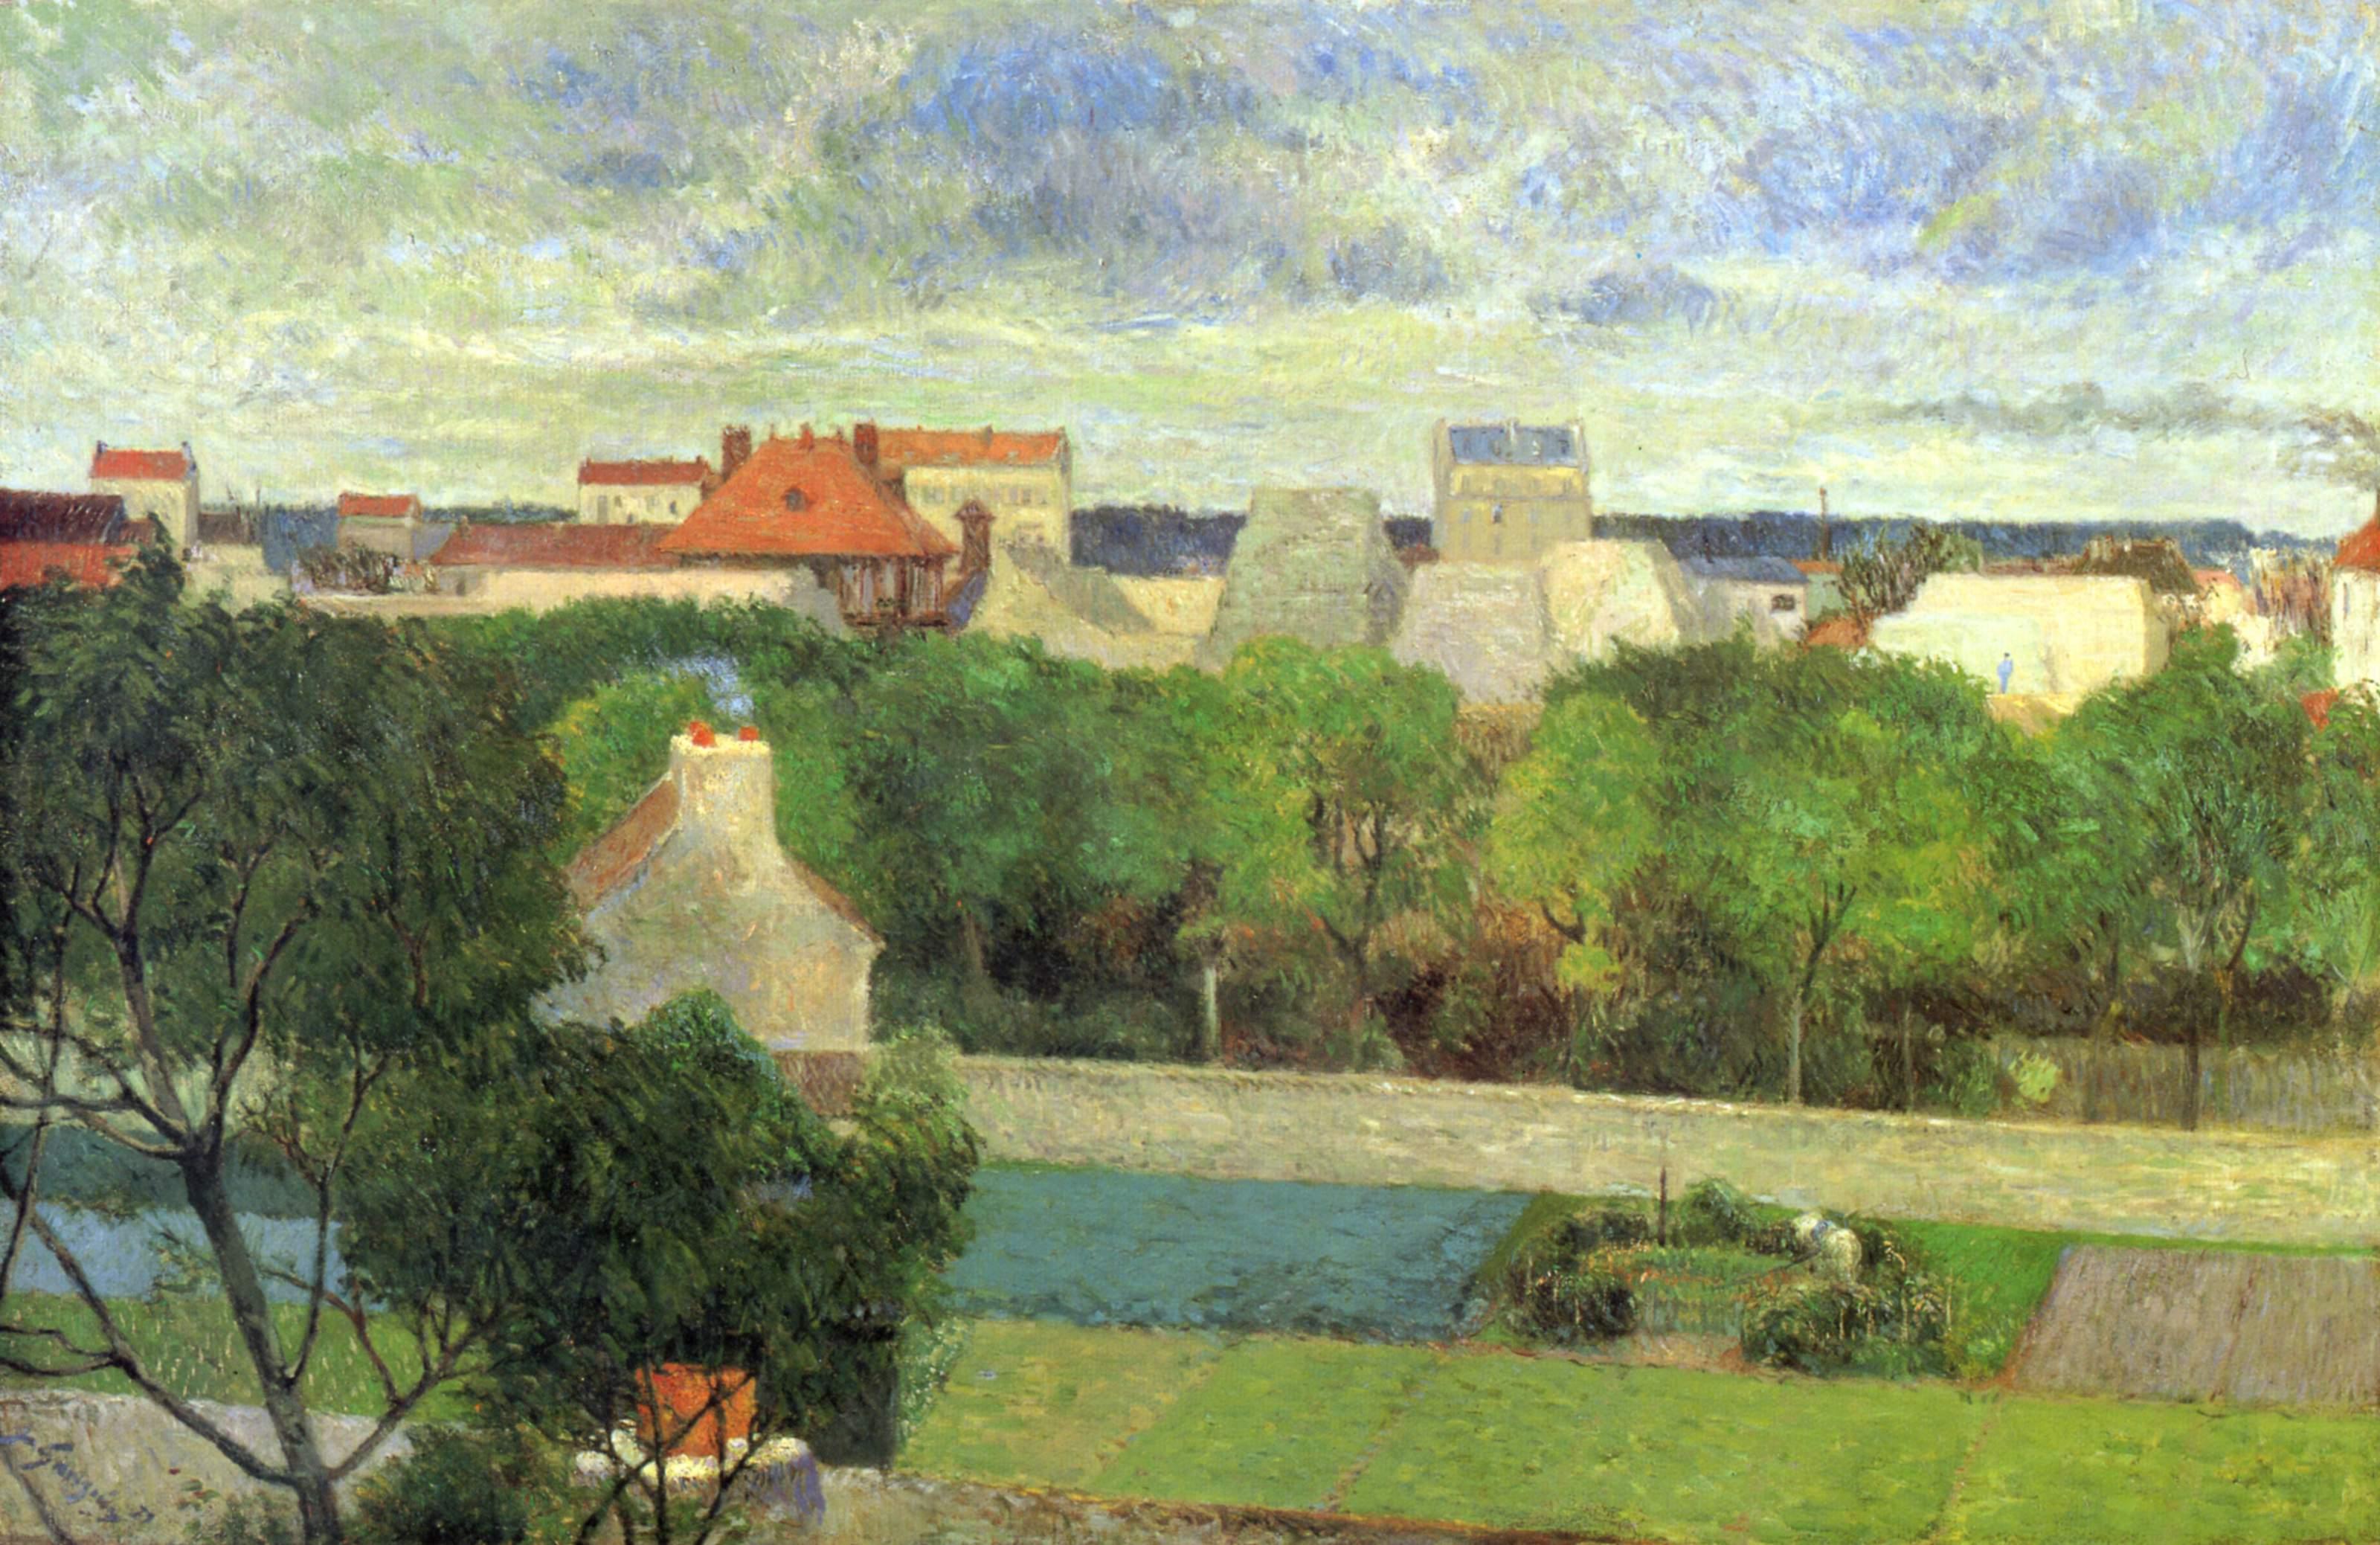 ������ < ���������, ������������ ����������� ����� >  :: ���� ����� [ �������� ����������������� ] - ����� ���� ( Paul Gauguin ) ����